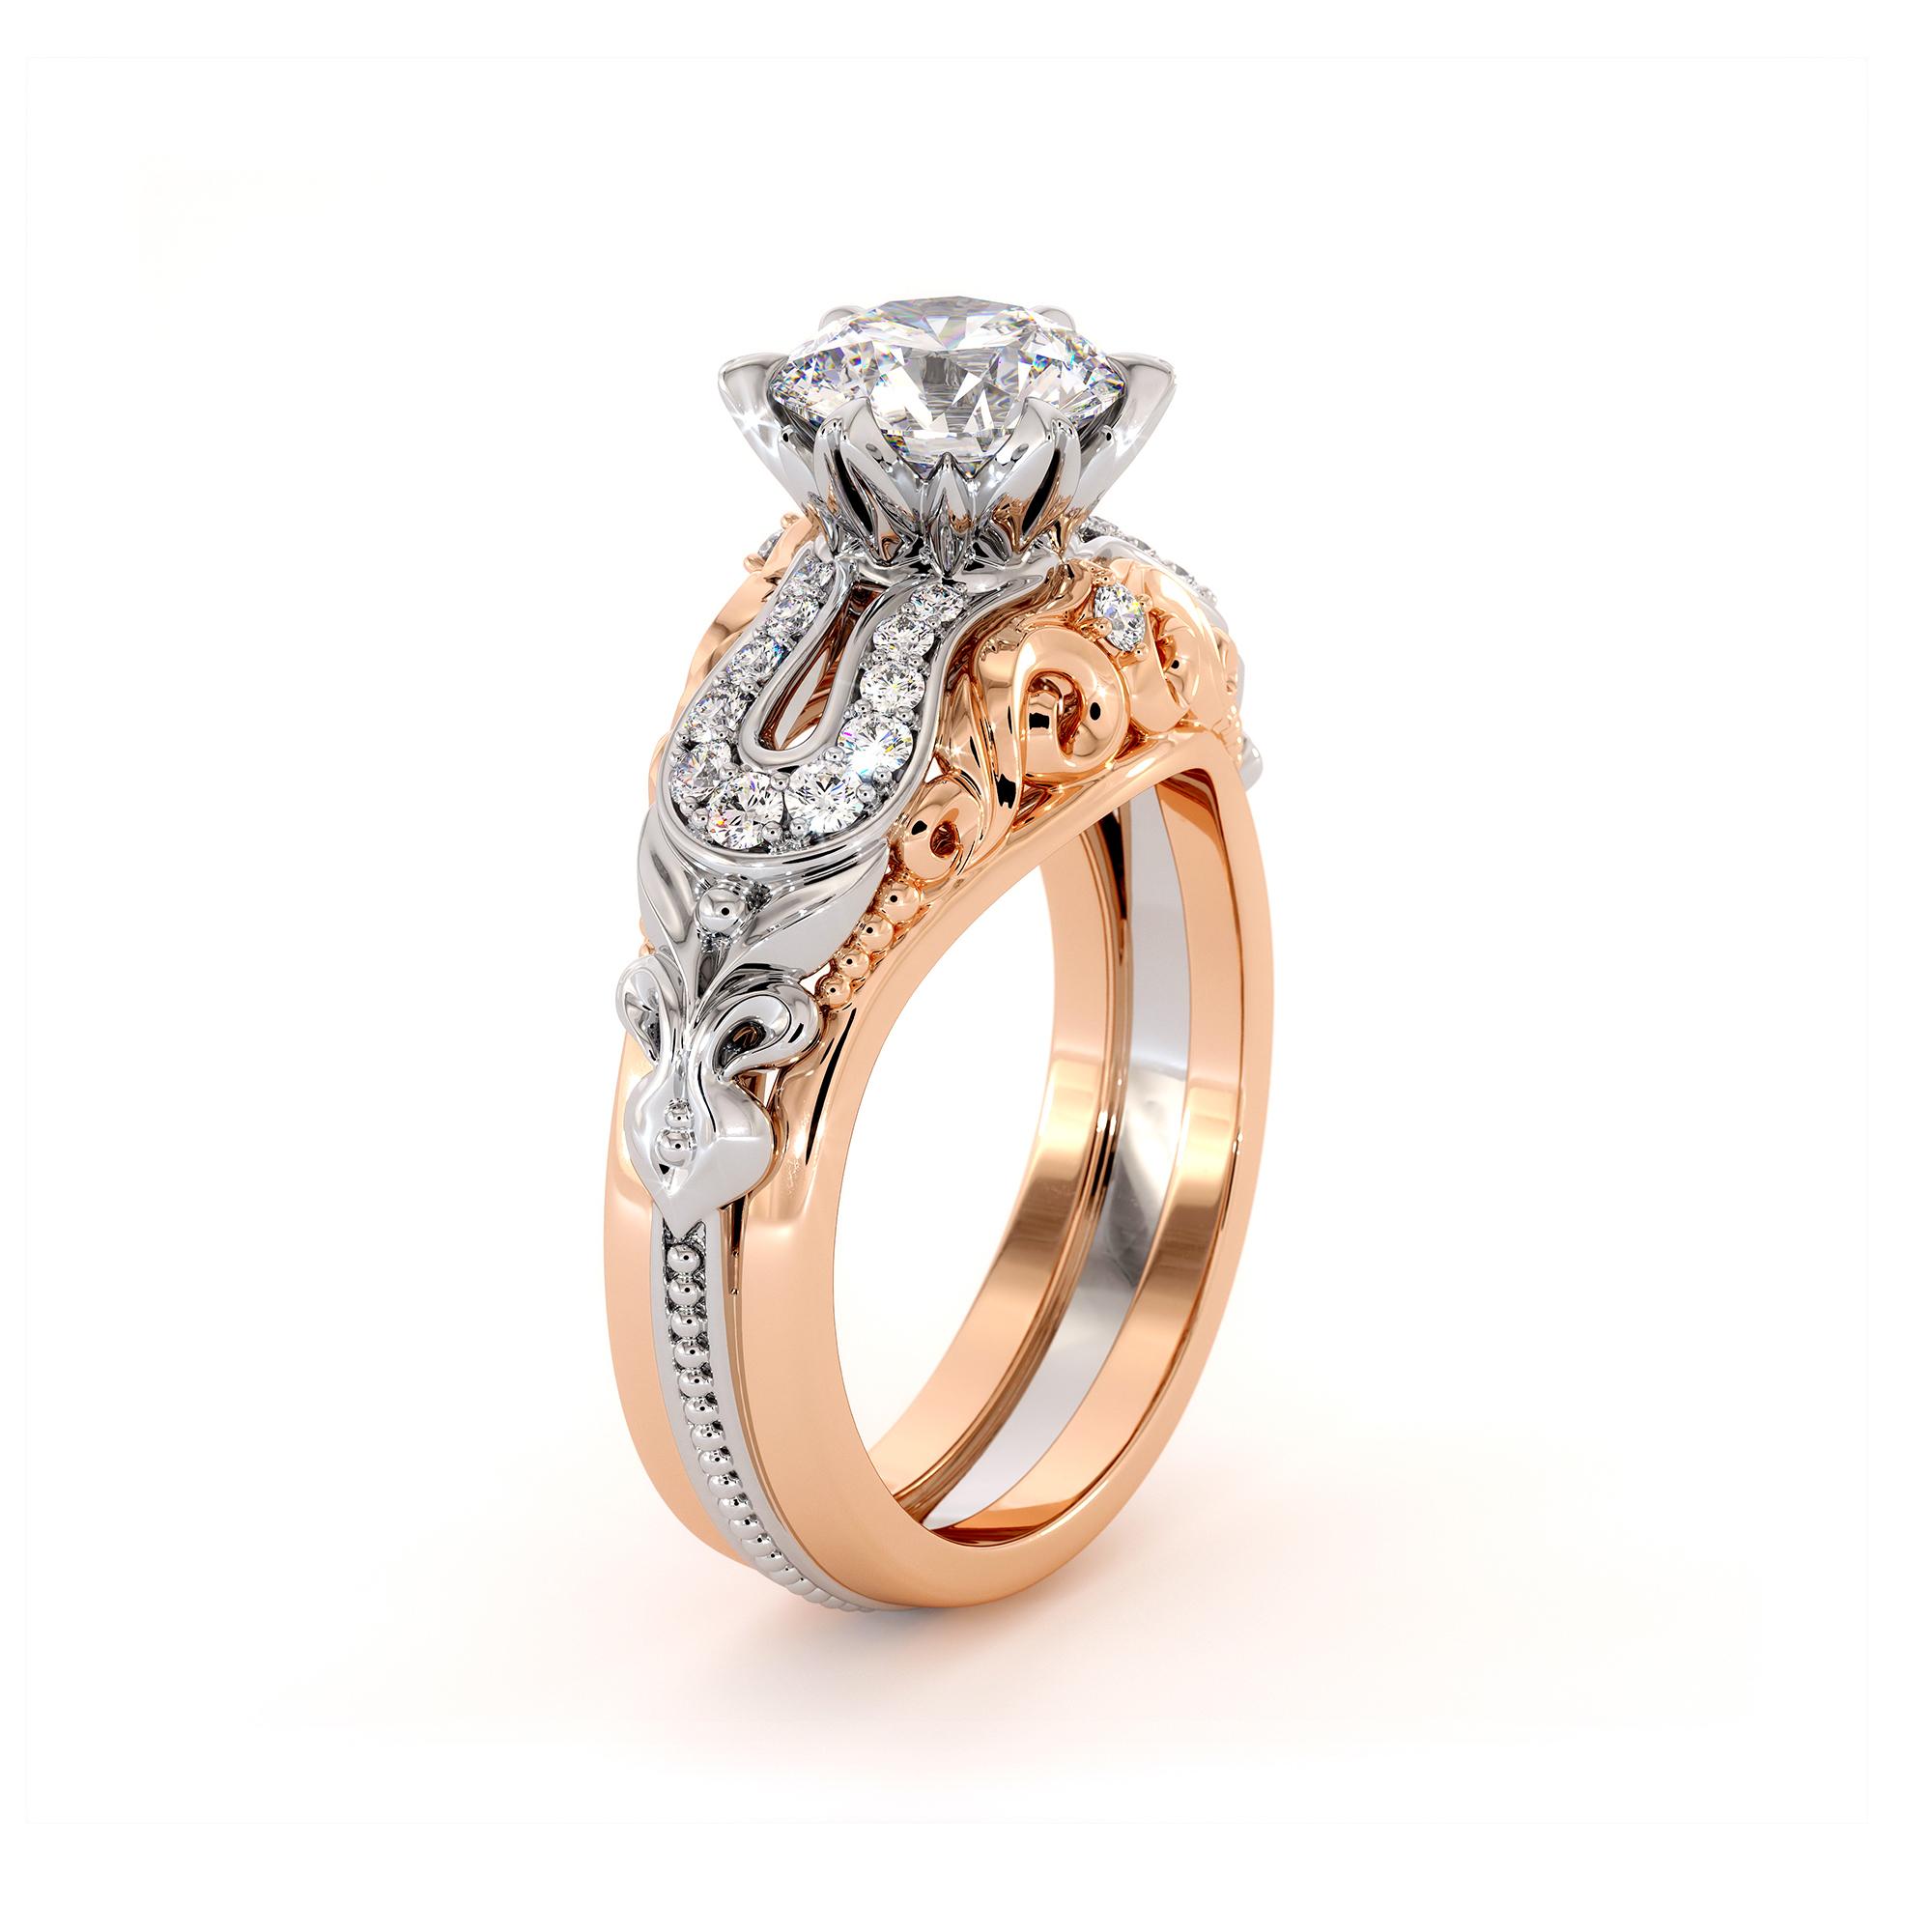 Unique Filigree Diamonds Engagement Ring White & Rose Gold Moissanite Deluxe Ring